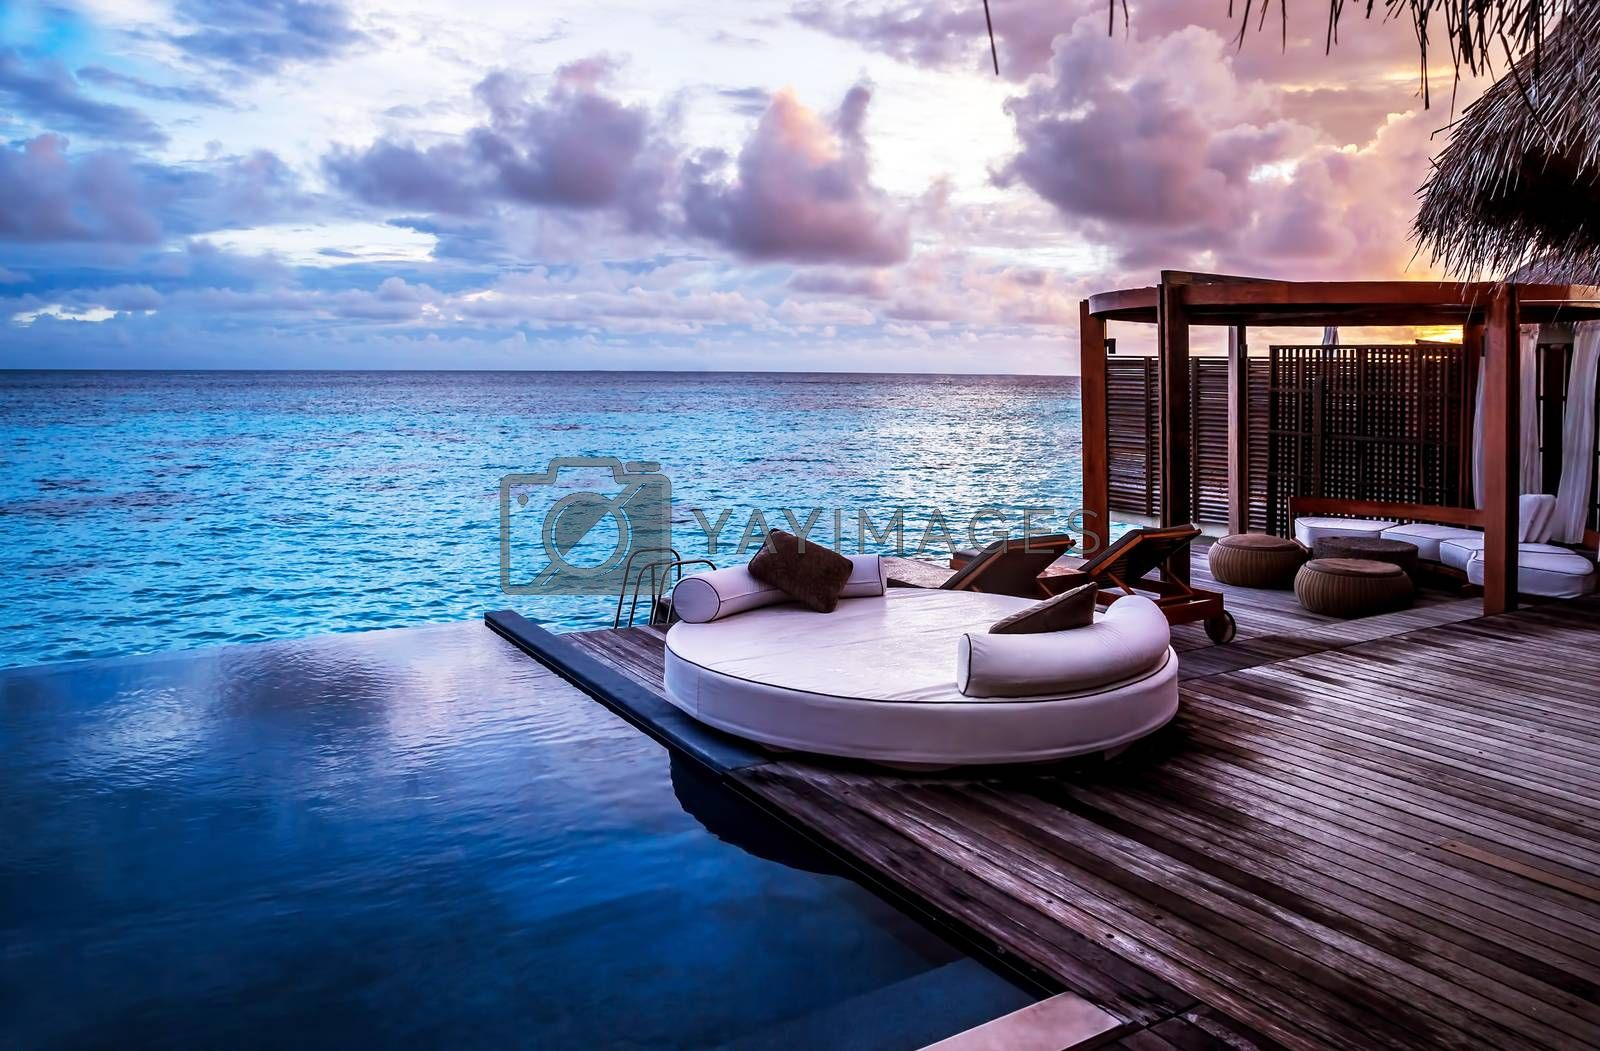 Royalty free image of Luxury beach resort by Anna_Omelchenko